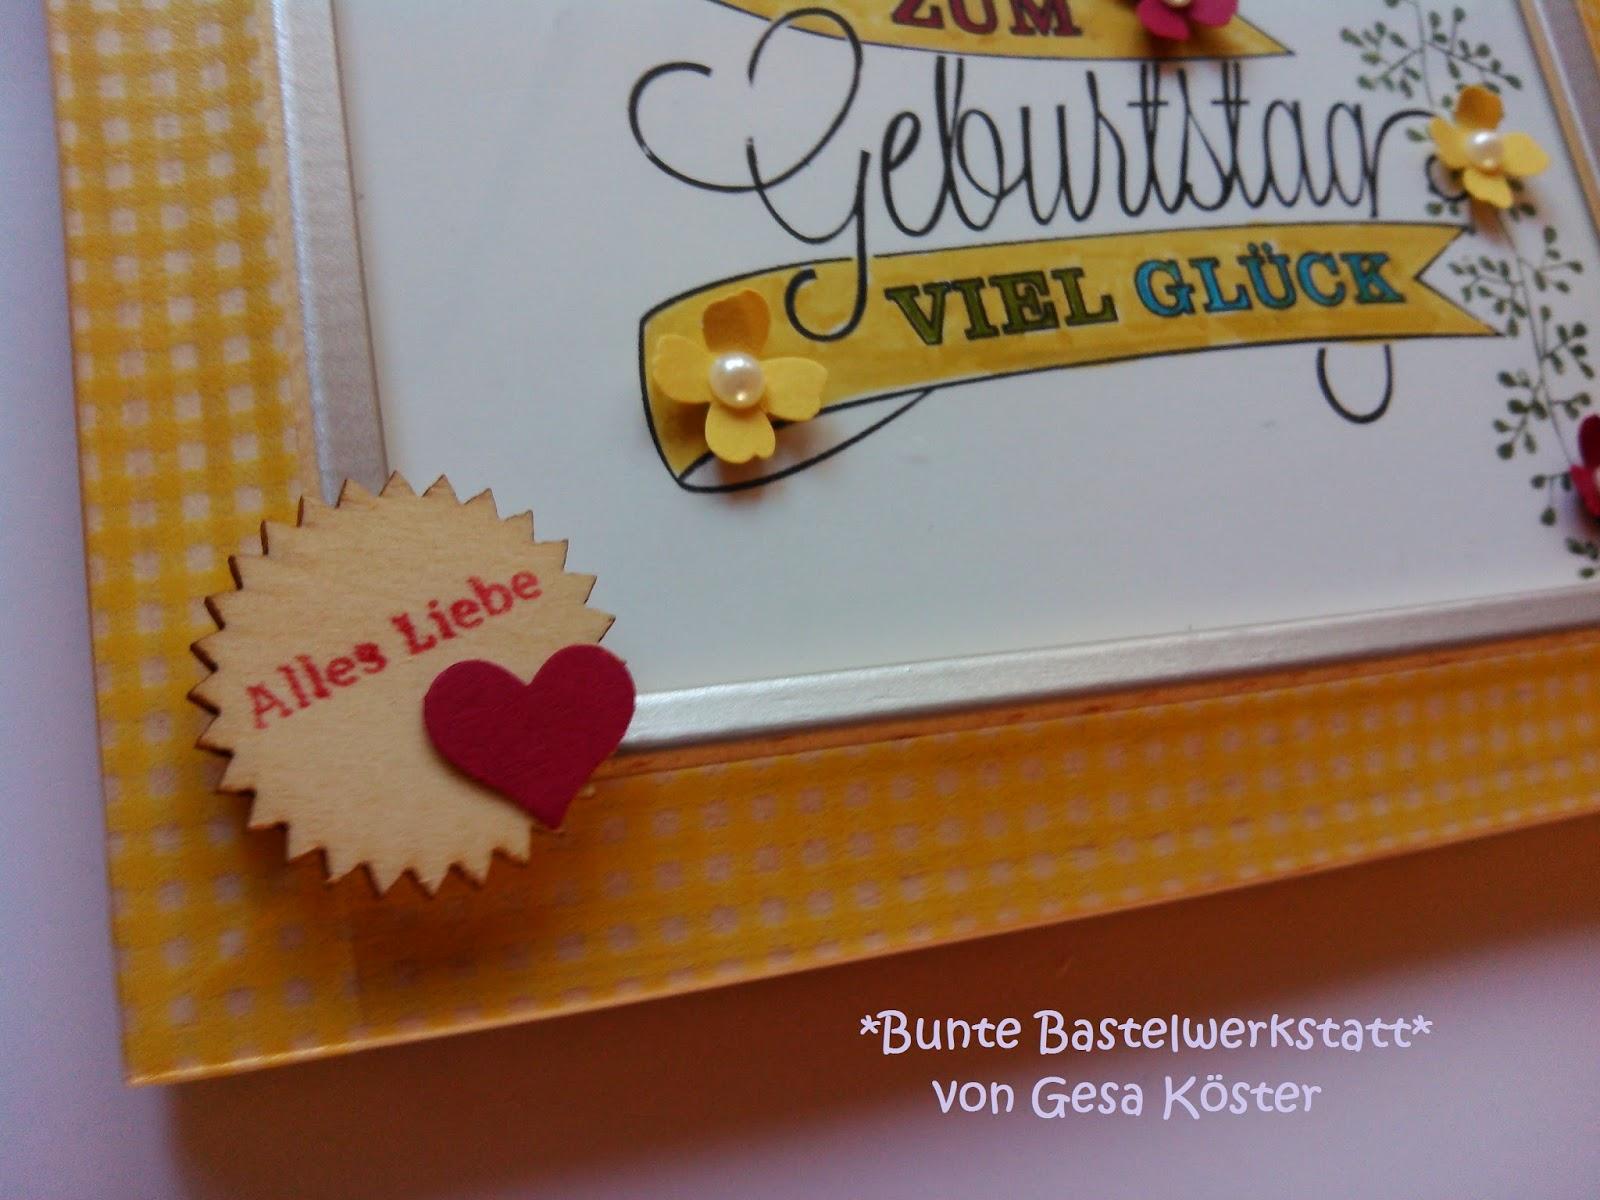 Bunte Bastelwerkstatt: 2014